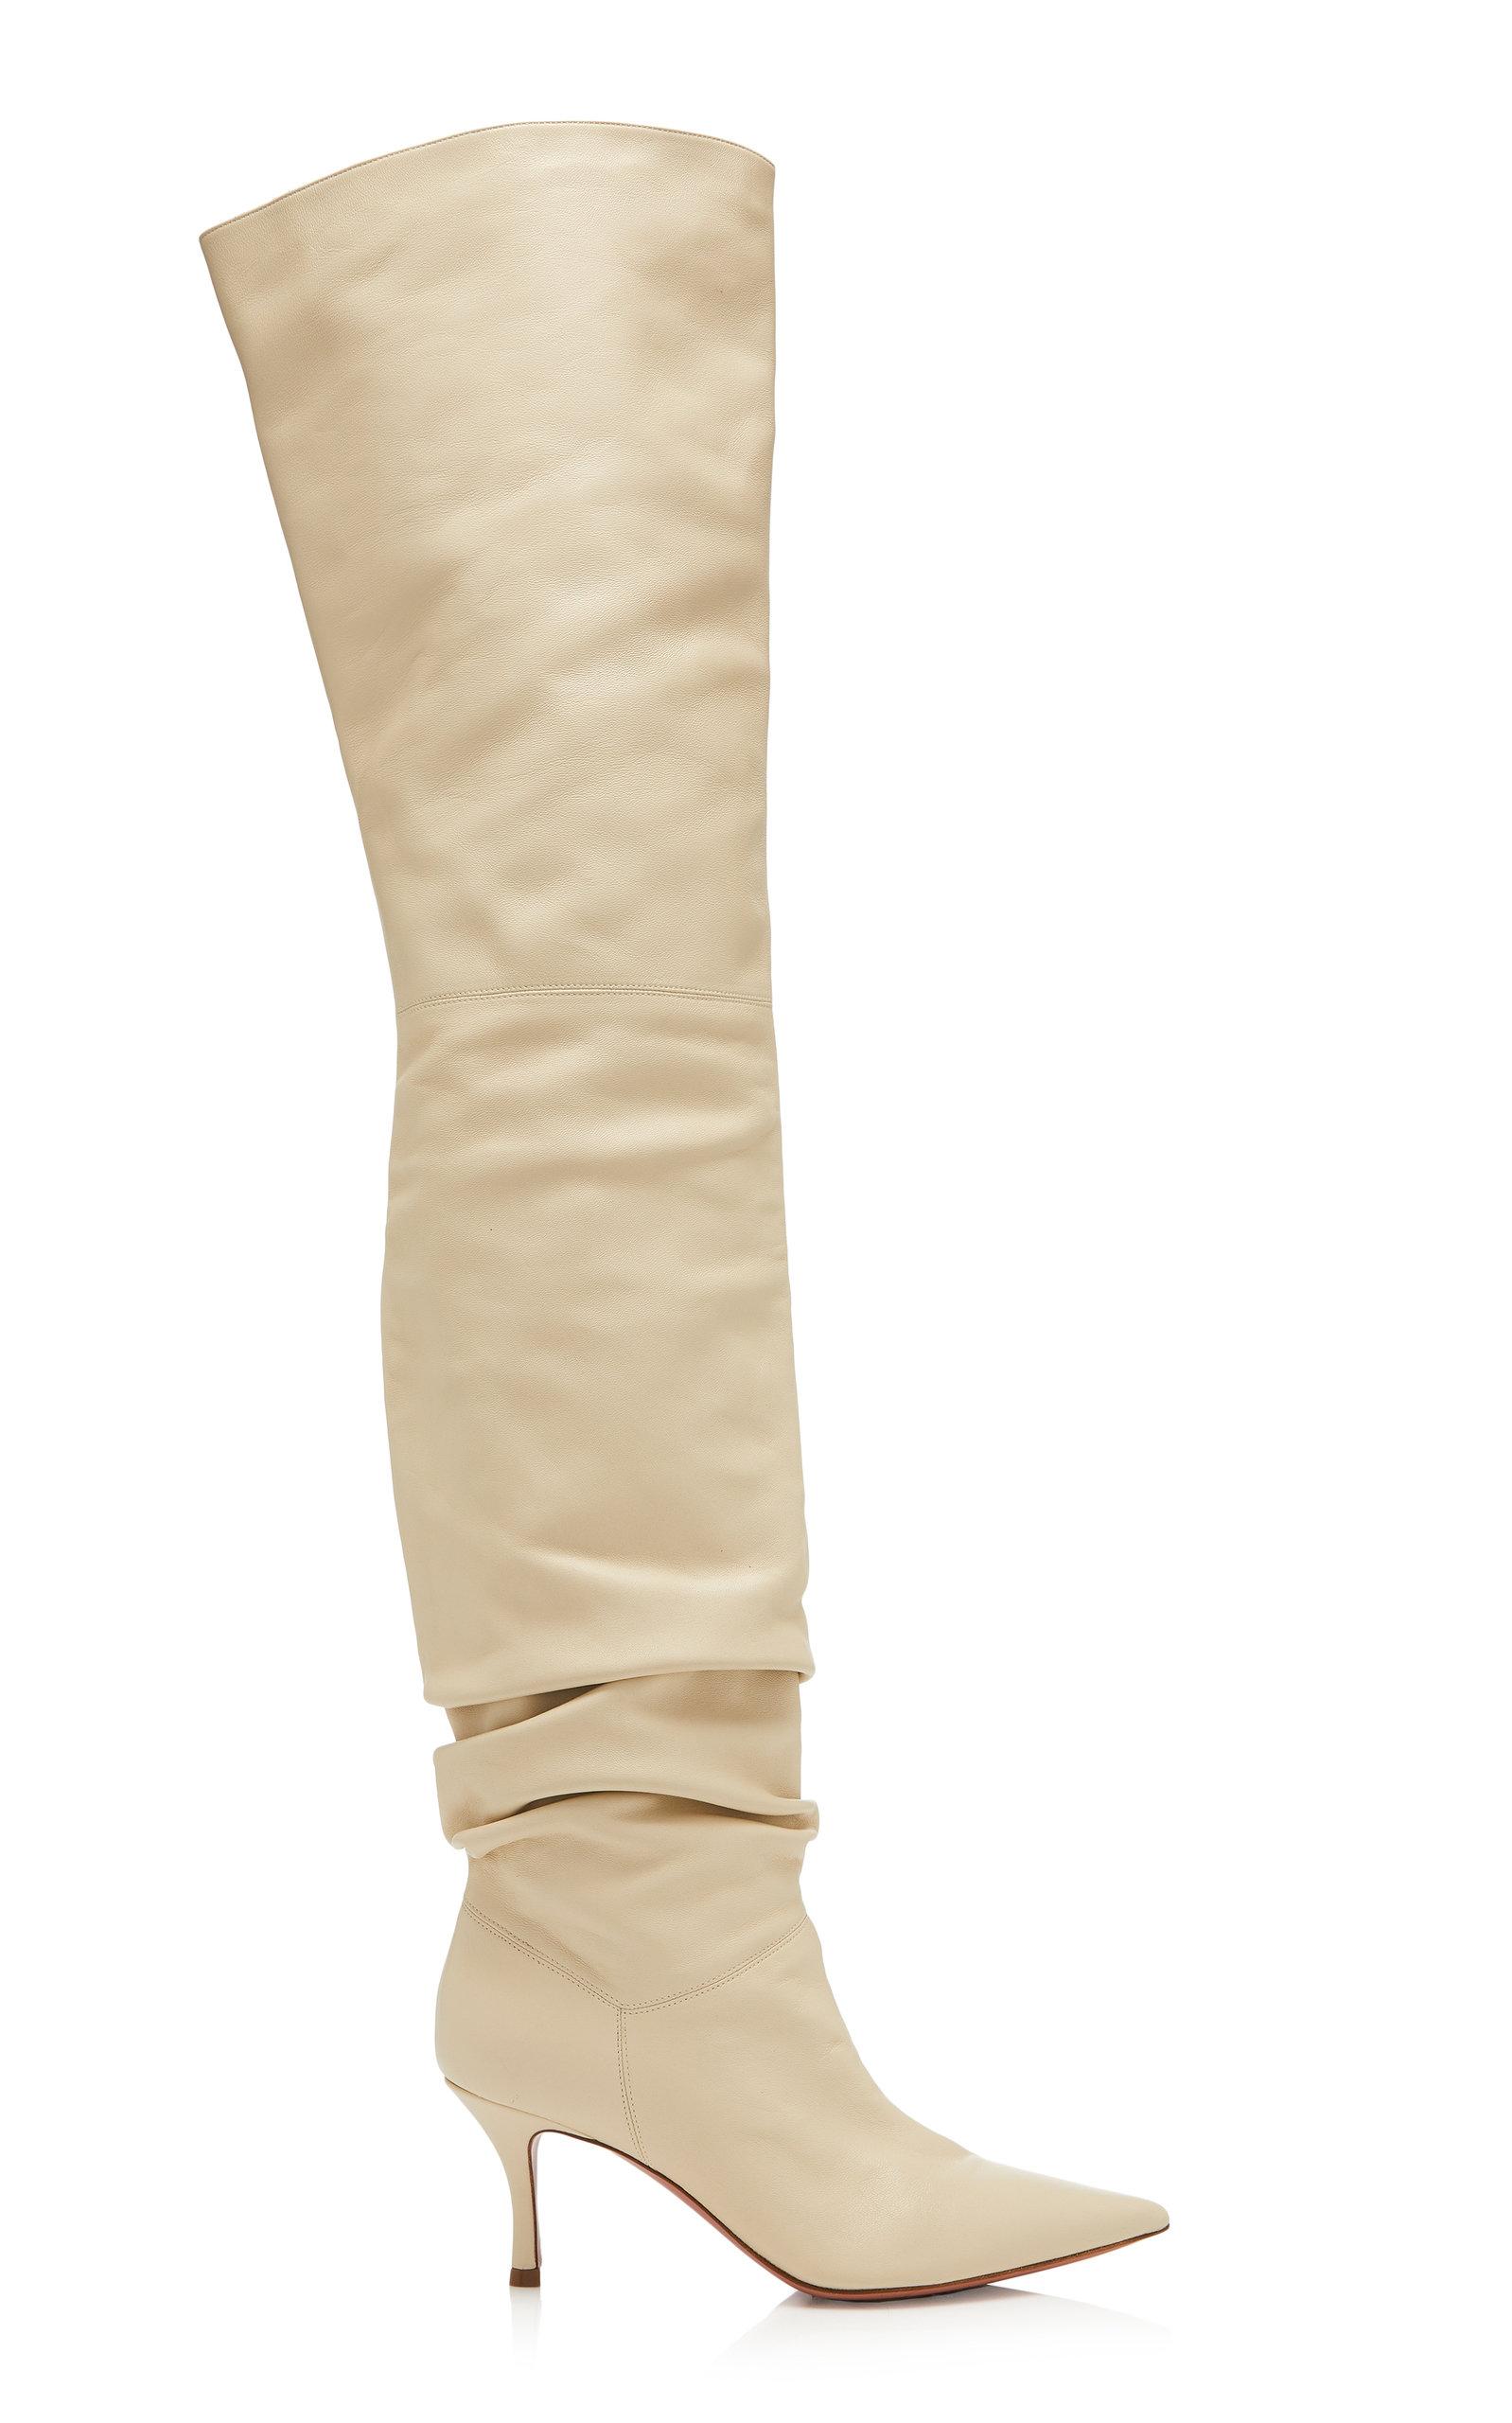 Amina Muaddi – Women's Barbara Leather Over-The-Knee Boots – White – Moda Operandi